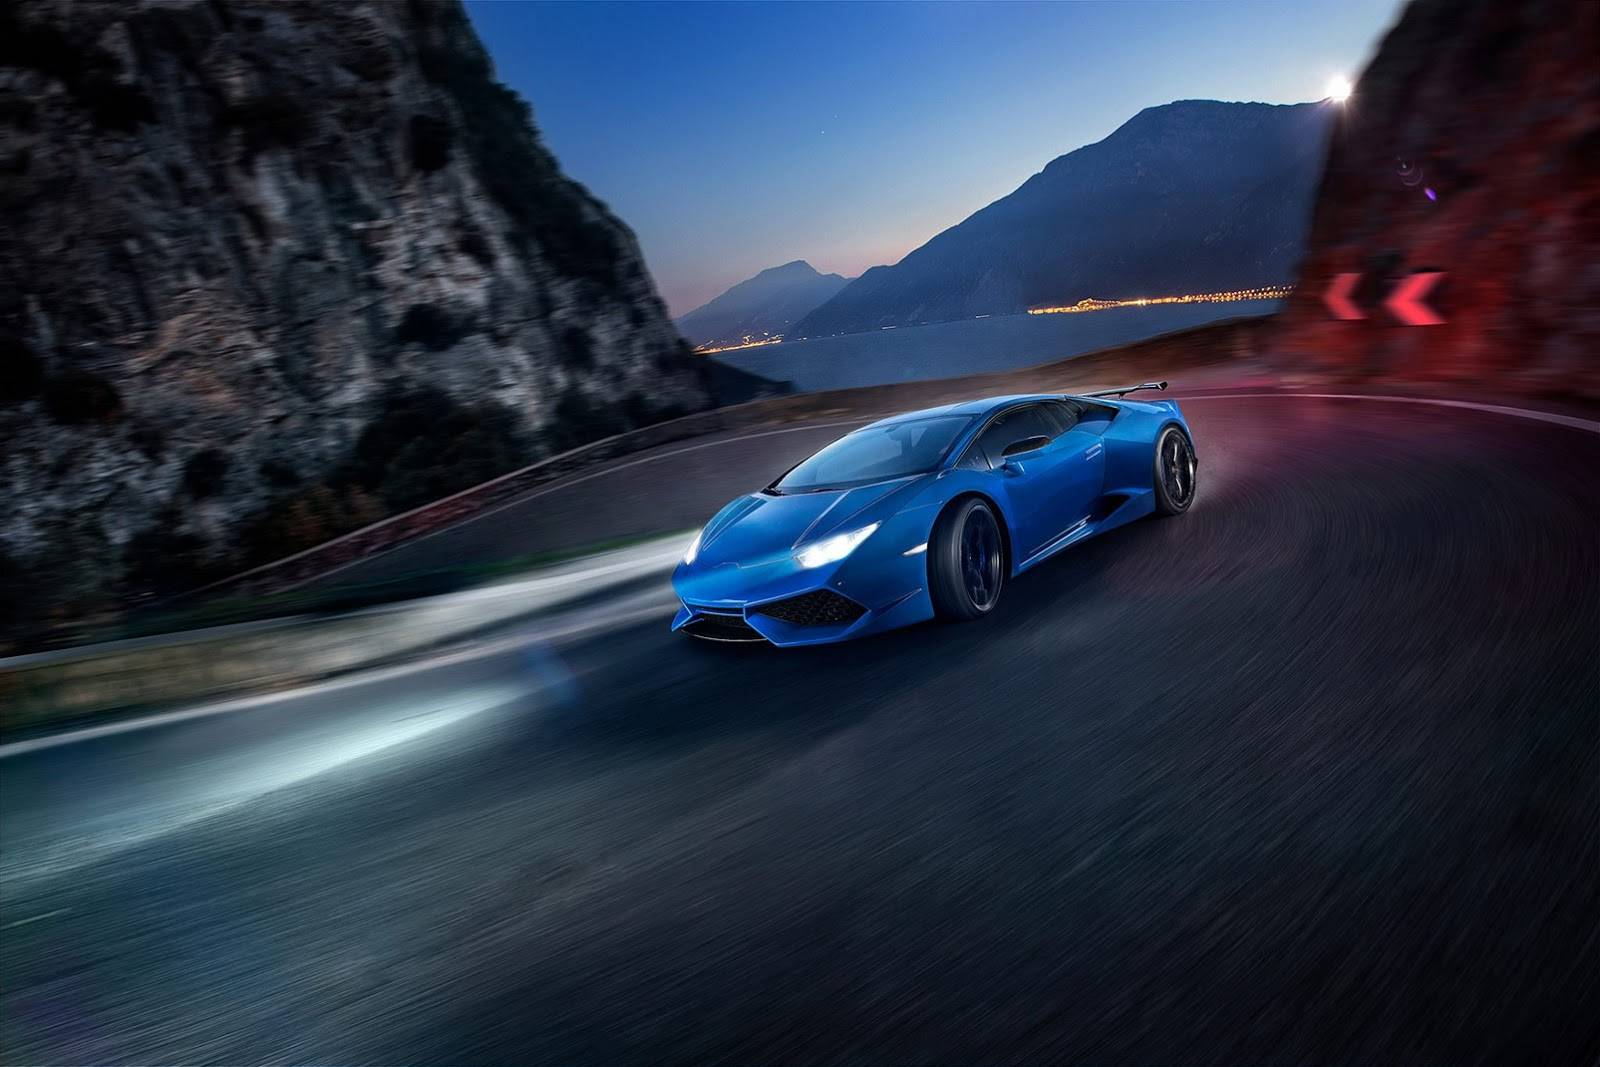 Novitec Torado Lamborghini Huracan N-Largo: 860 CV y una estética muy bruta 4